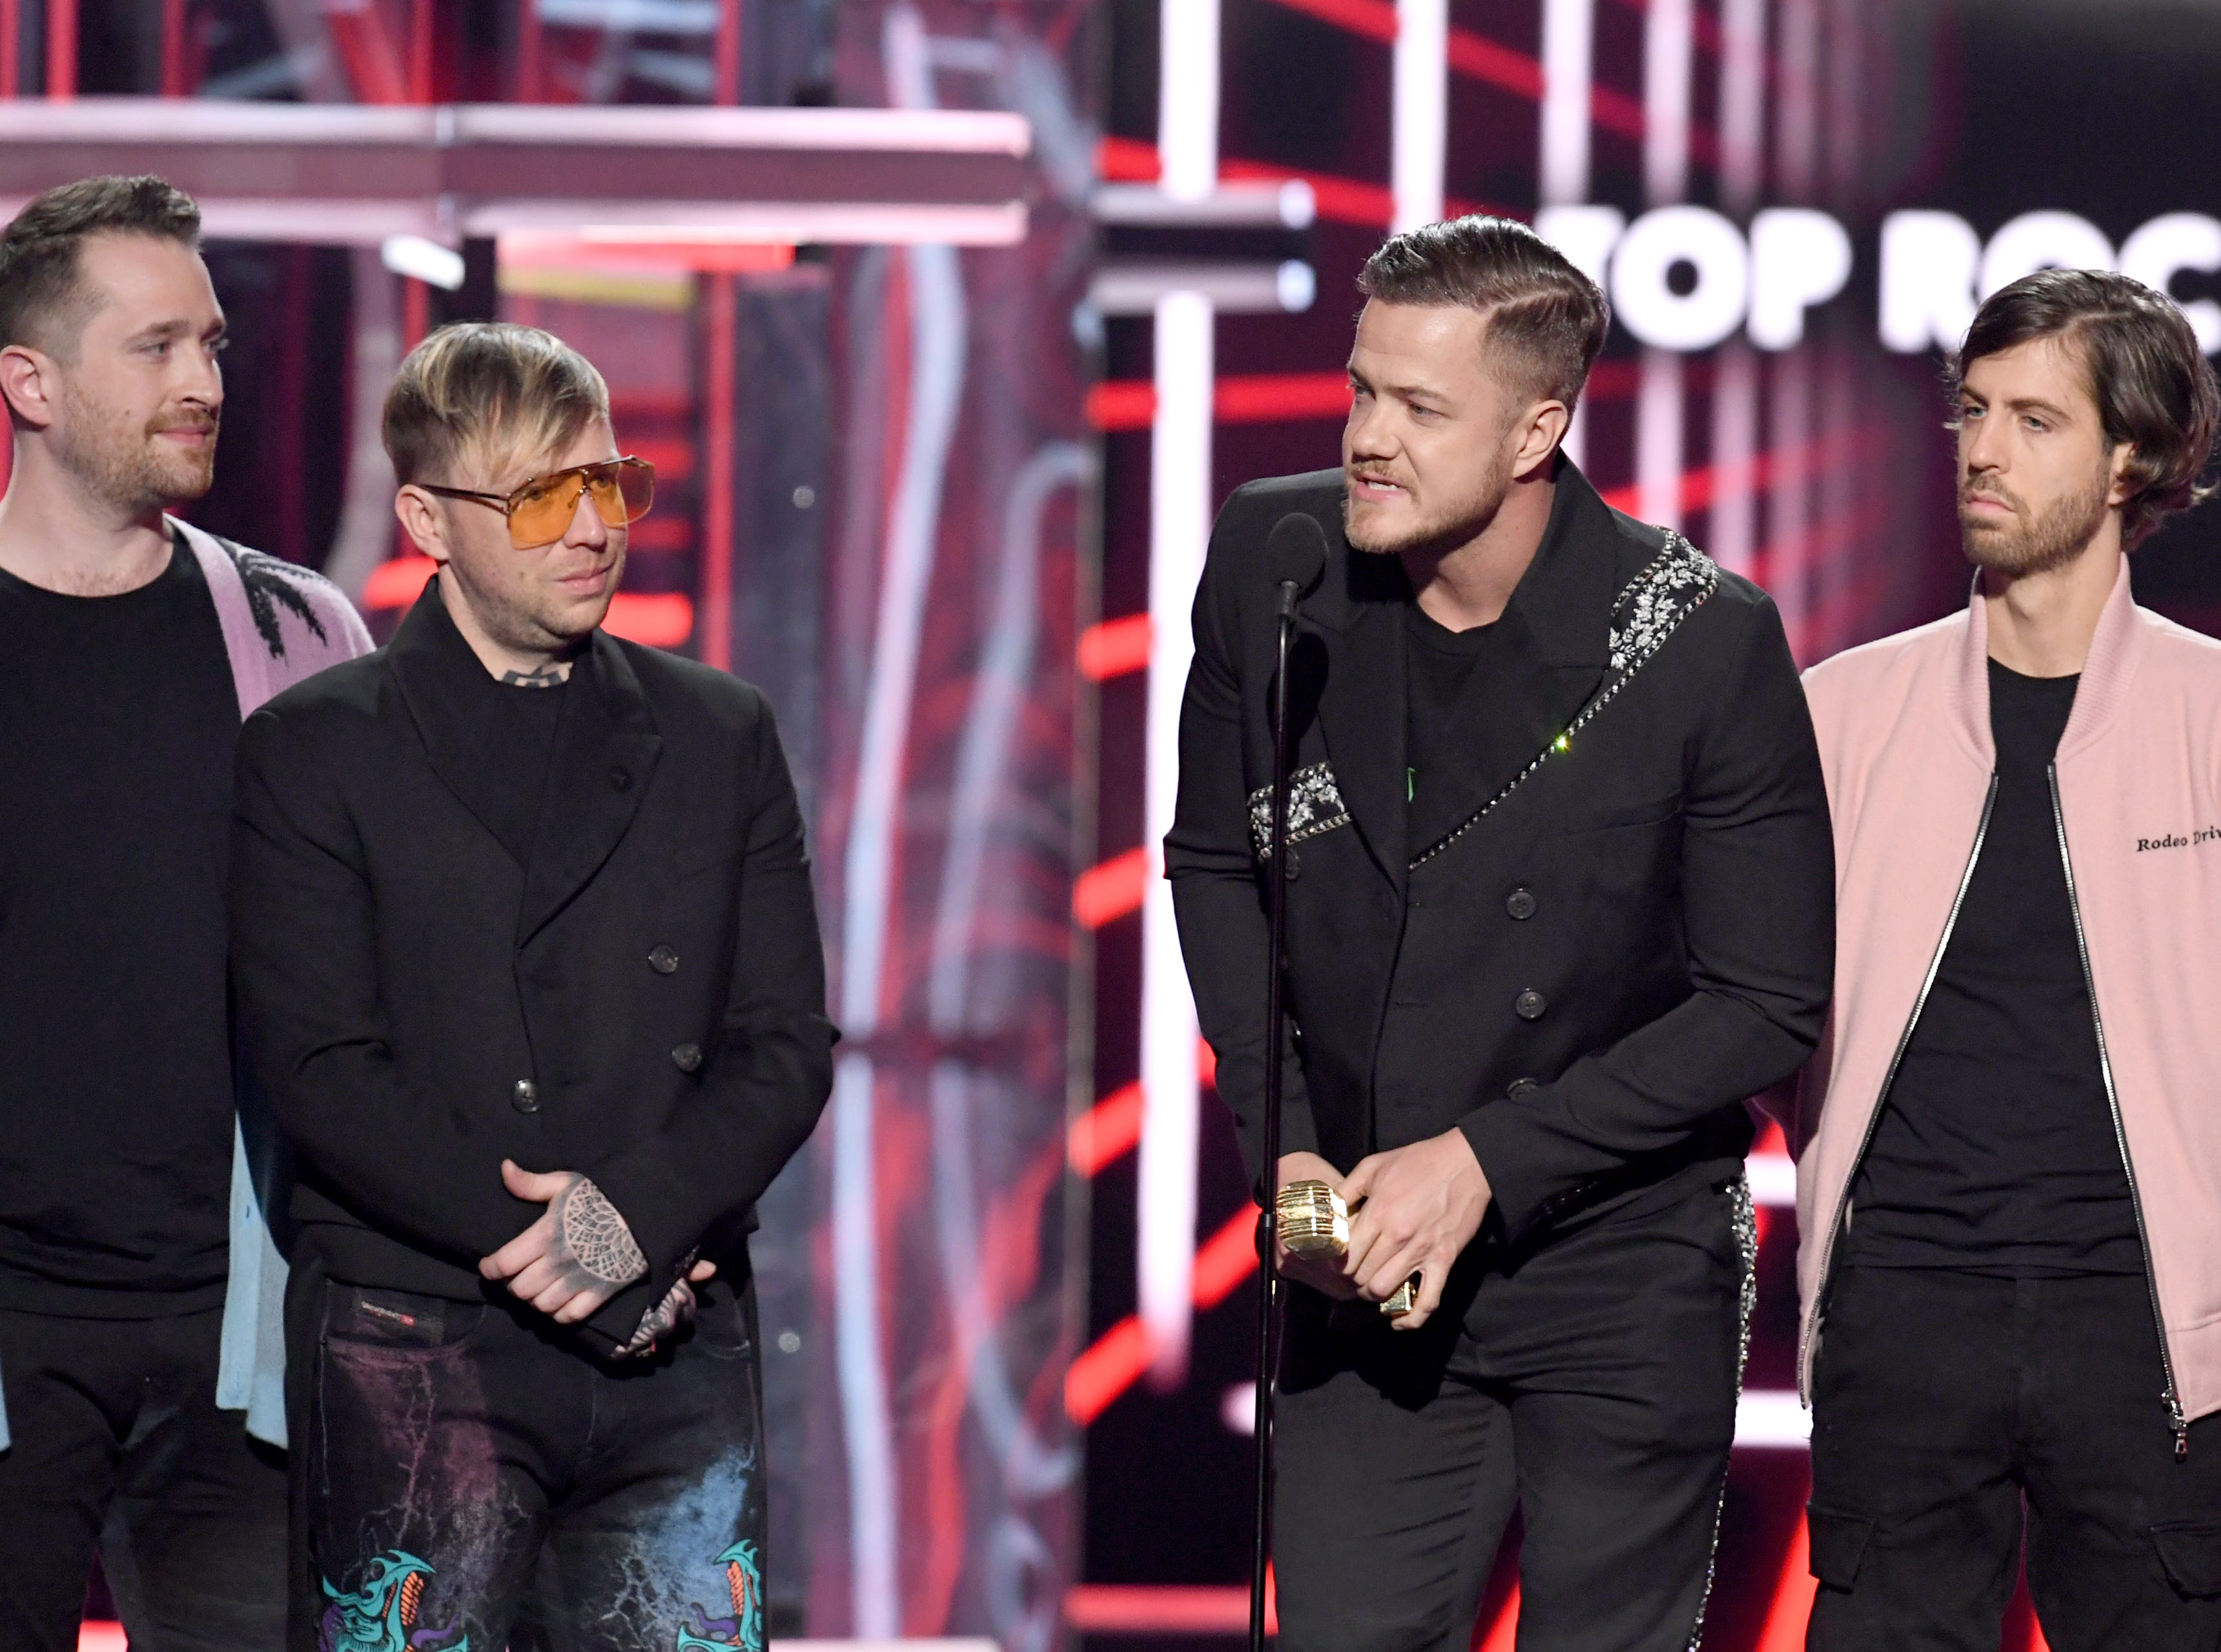 (L-R) Daniel Platzman, Ben McKee, Dan Reynolds, and Wayne Sermon of Imagine Dragons accept the Top Rock Artist award onstage during the 2019 Billboard Music Awards at MGM Grand Garden Arena on May 01, 2019 in Las Vegas, Nevada.